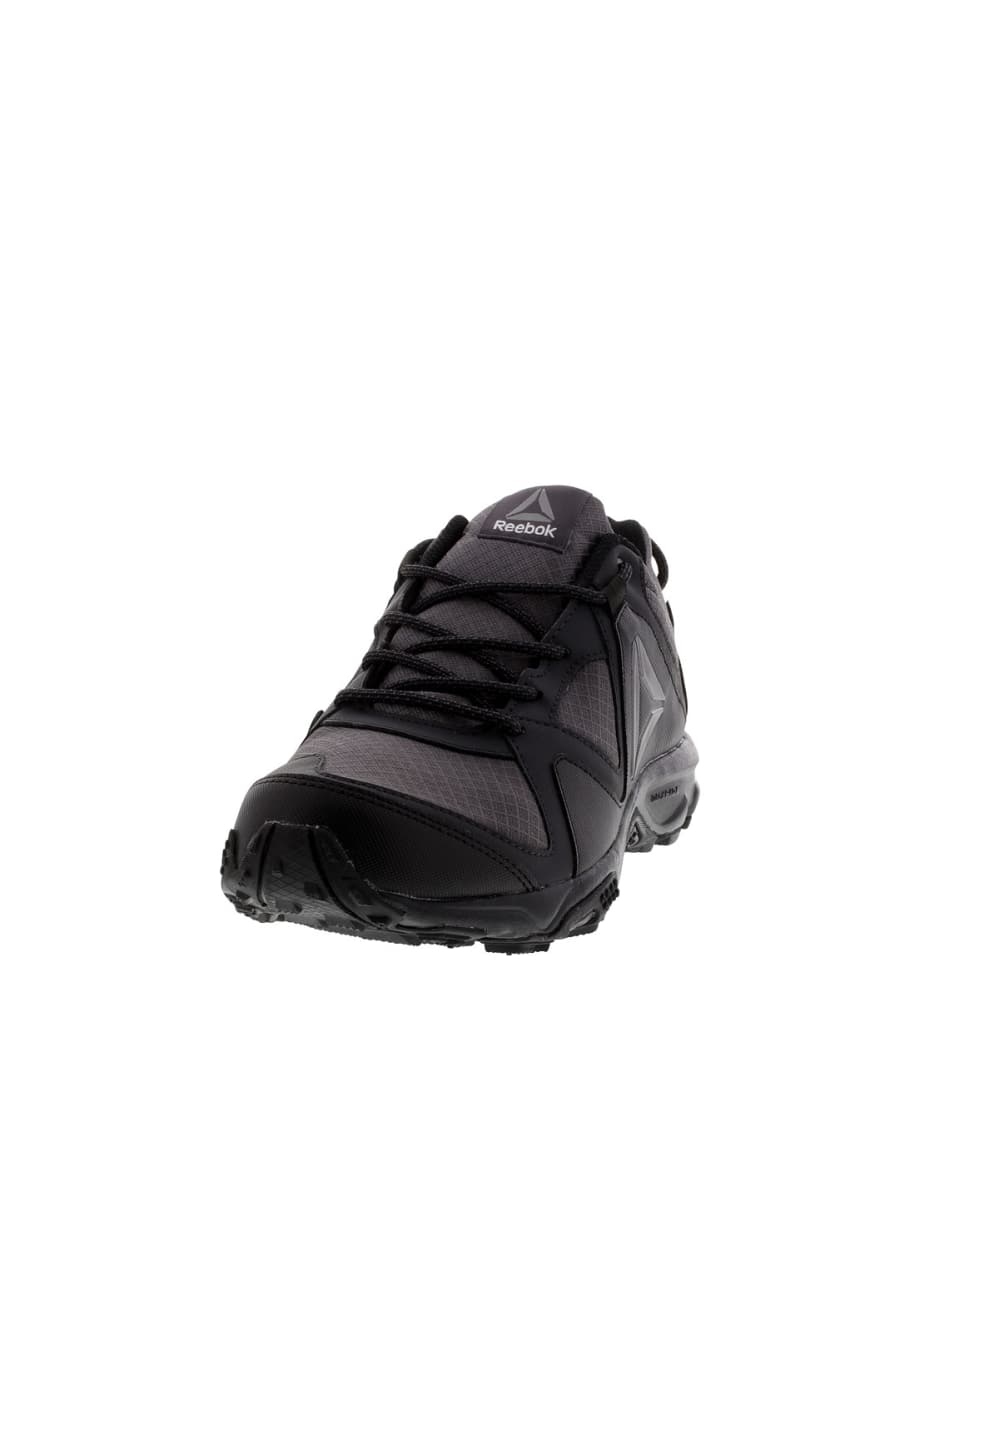 6ffcc3e24d6 Reebok Franconia Ridge 3.0 GTX - Outdoor shoes for Women - Black